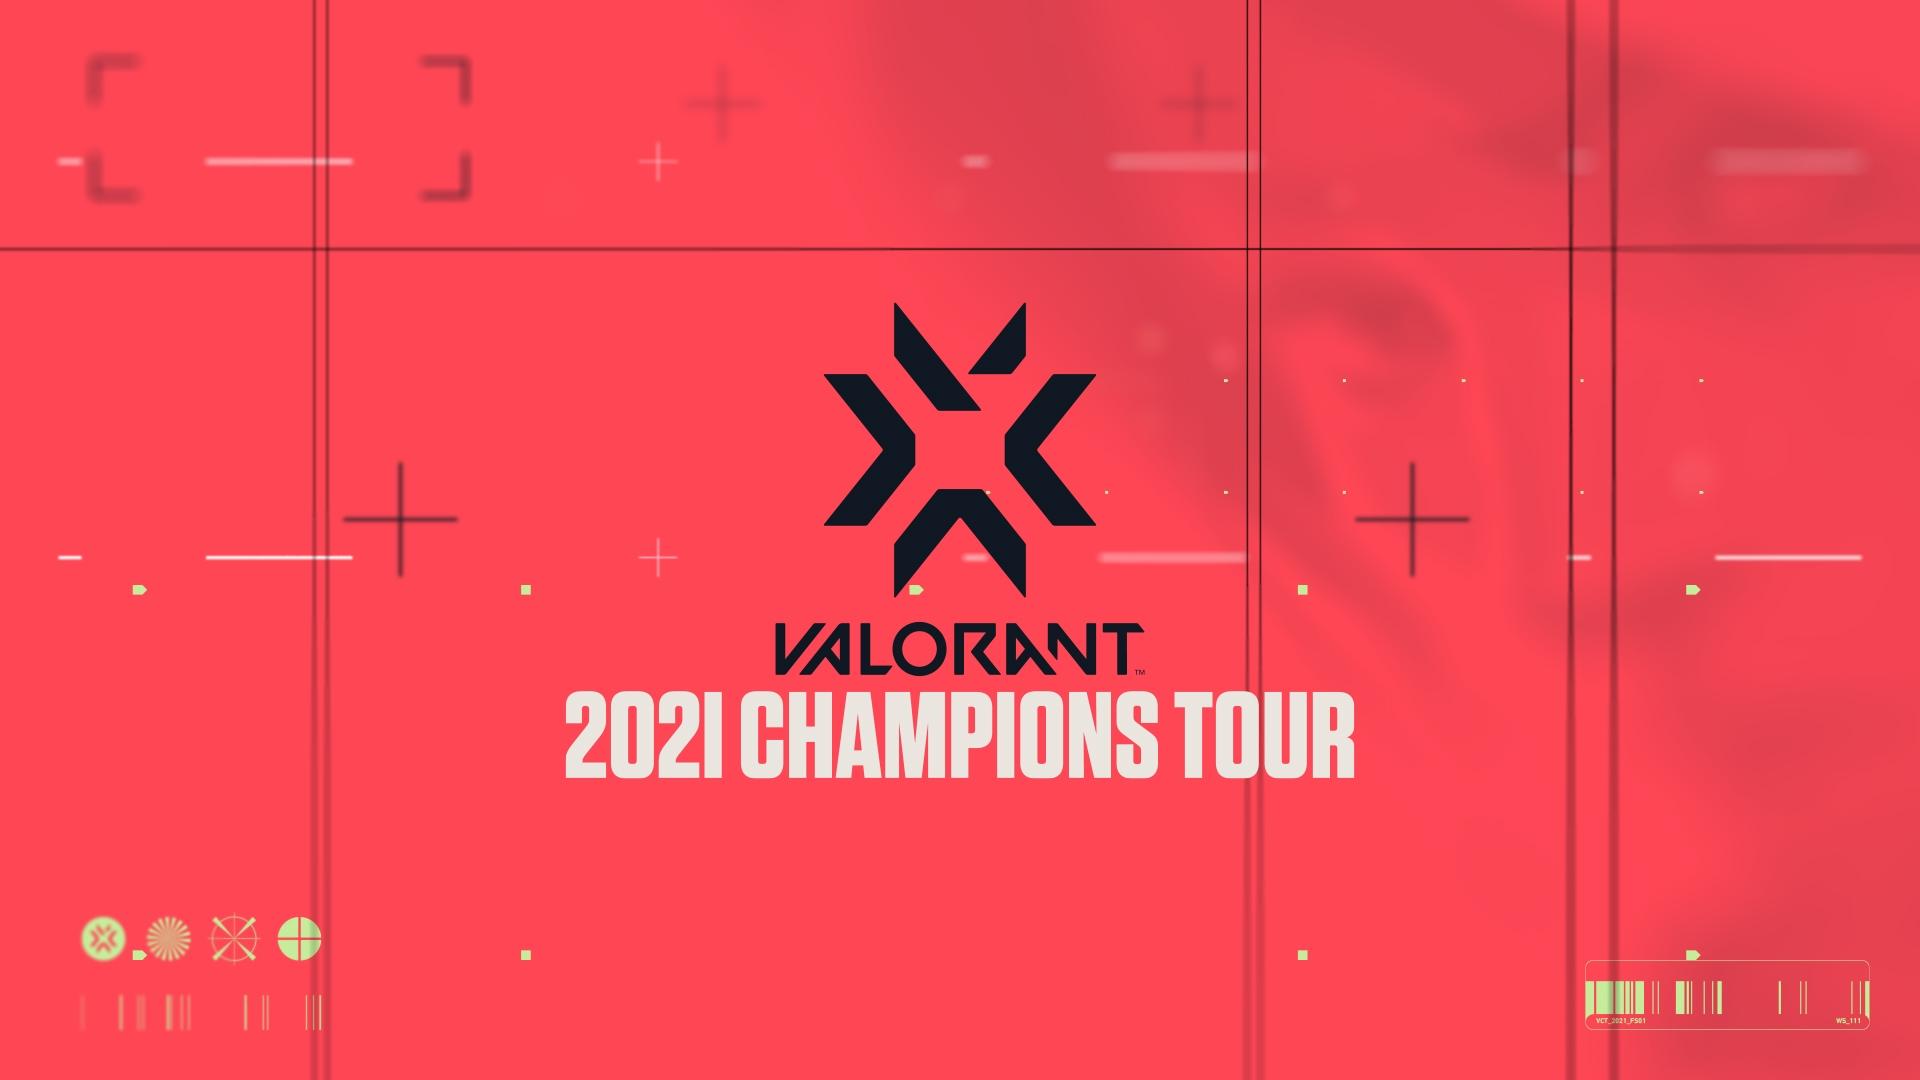 Announcing the 2021 VALORANT Champions Tour